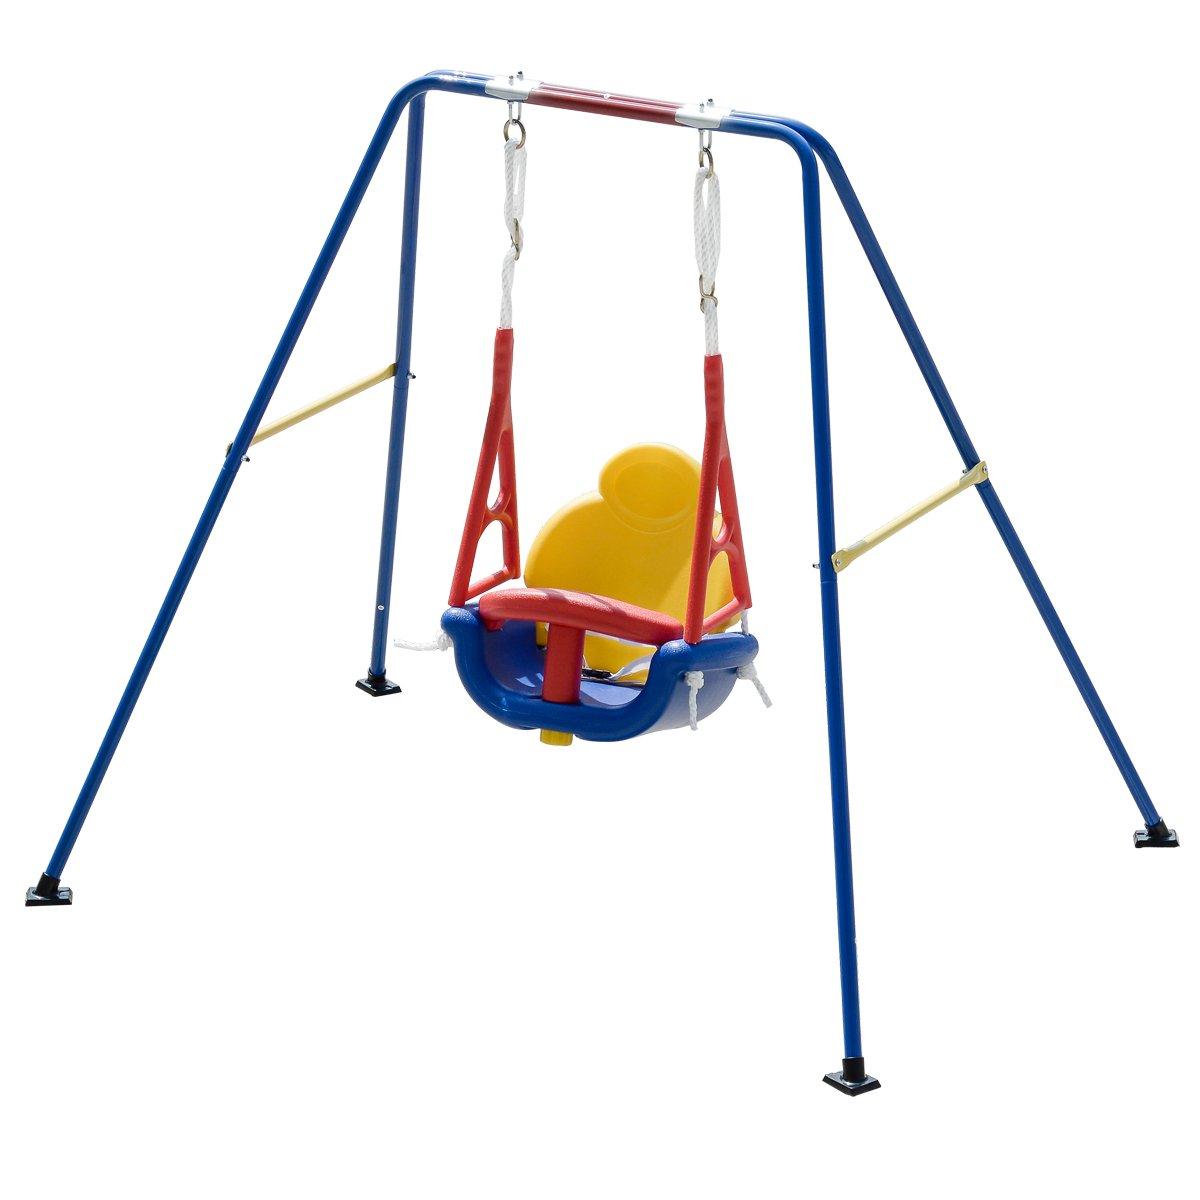 Costzon Toddler Climber and Swing Set, Junior Basketball Hoop Playset for Both Indoors & Backyard (Single Swing Set)